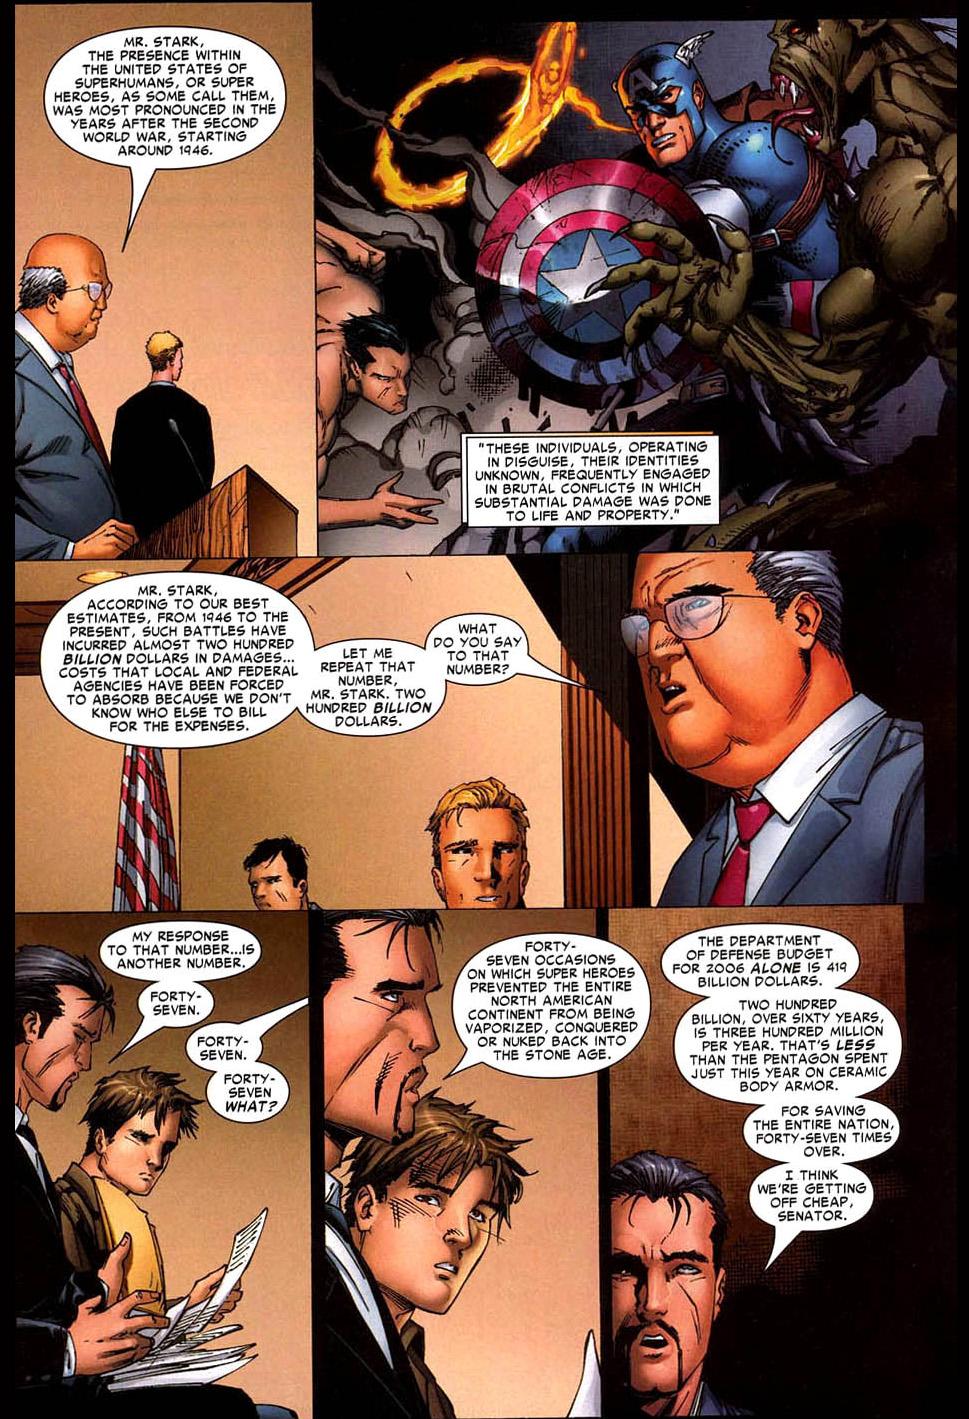 tony stark and peter parker argue against super human registration